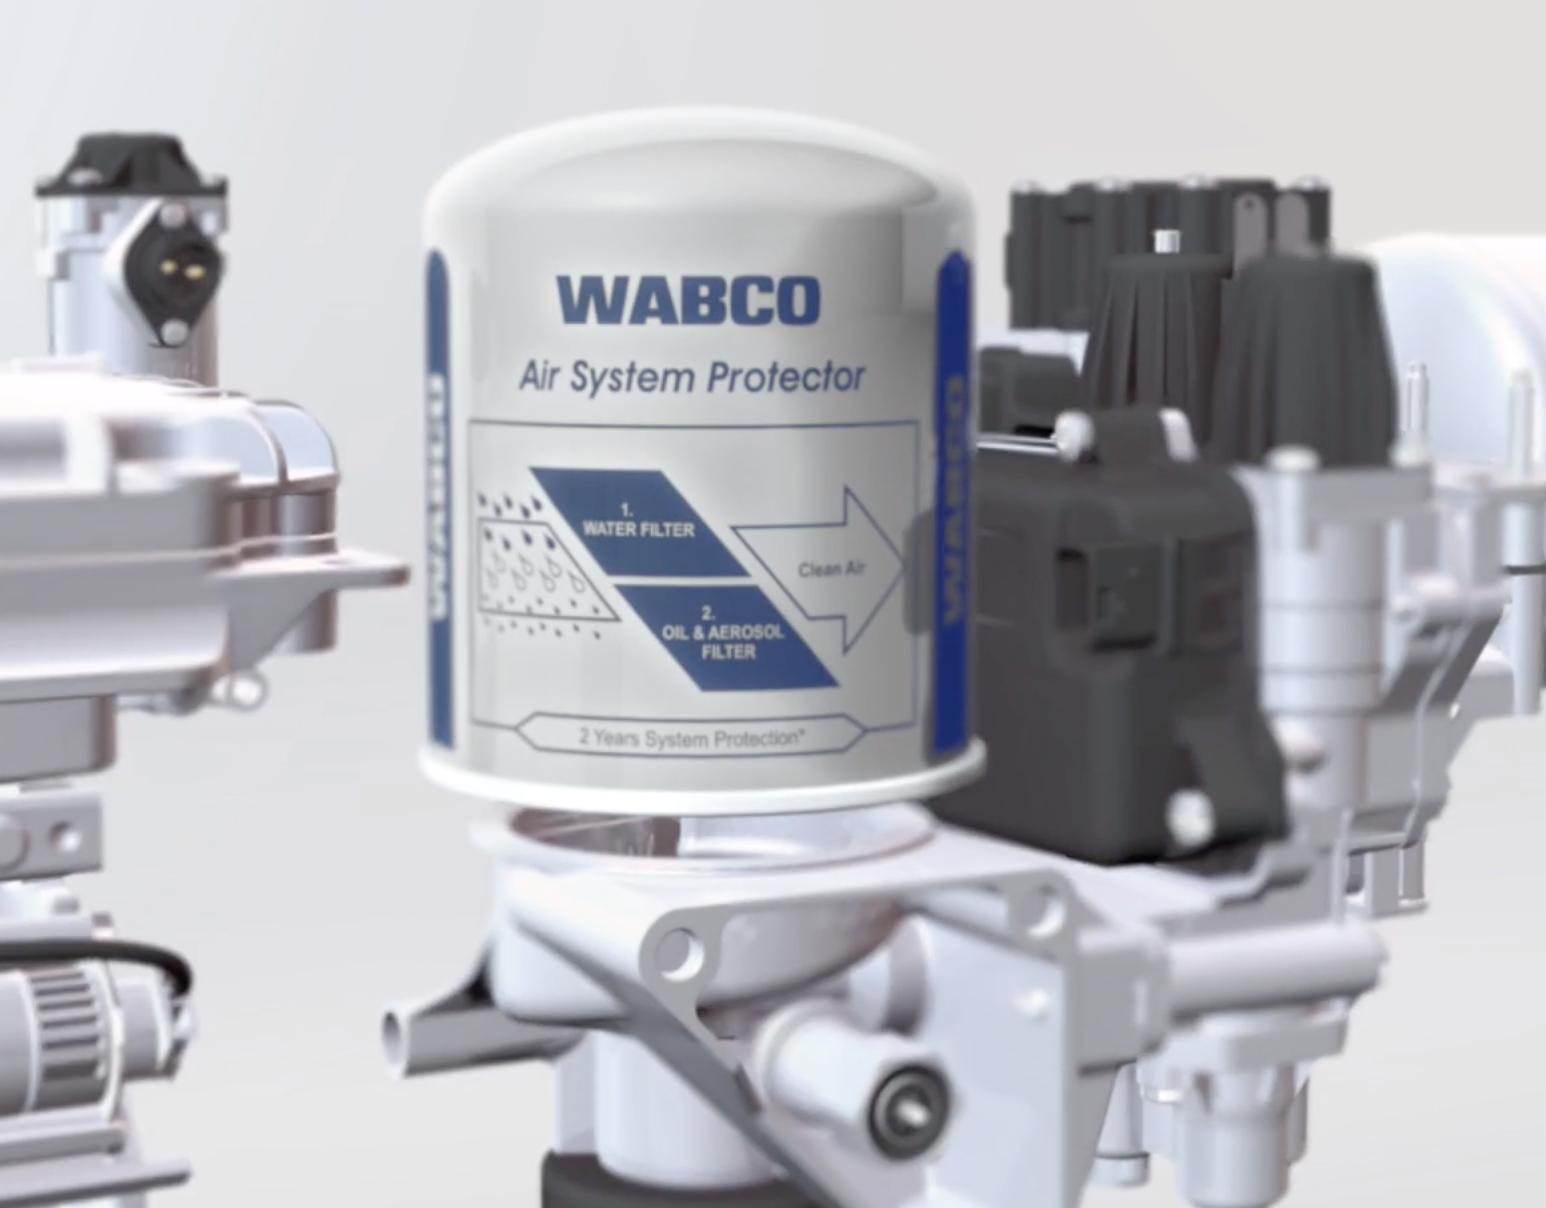 Wabco 3D Visualisierung